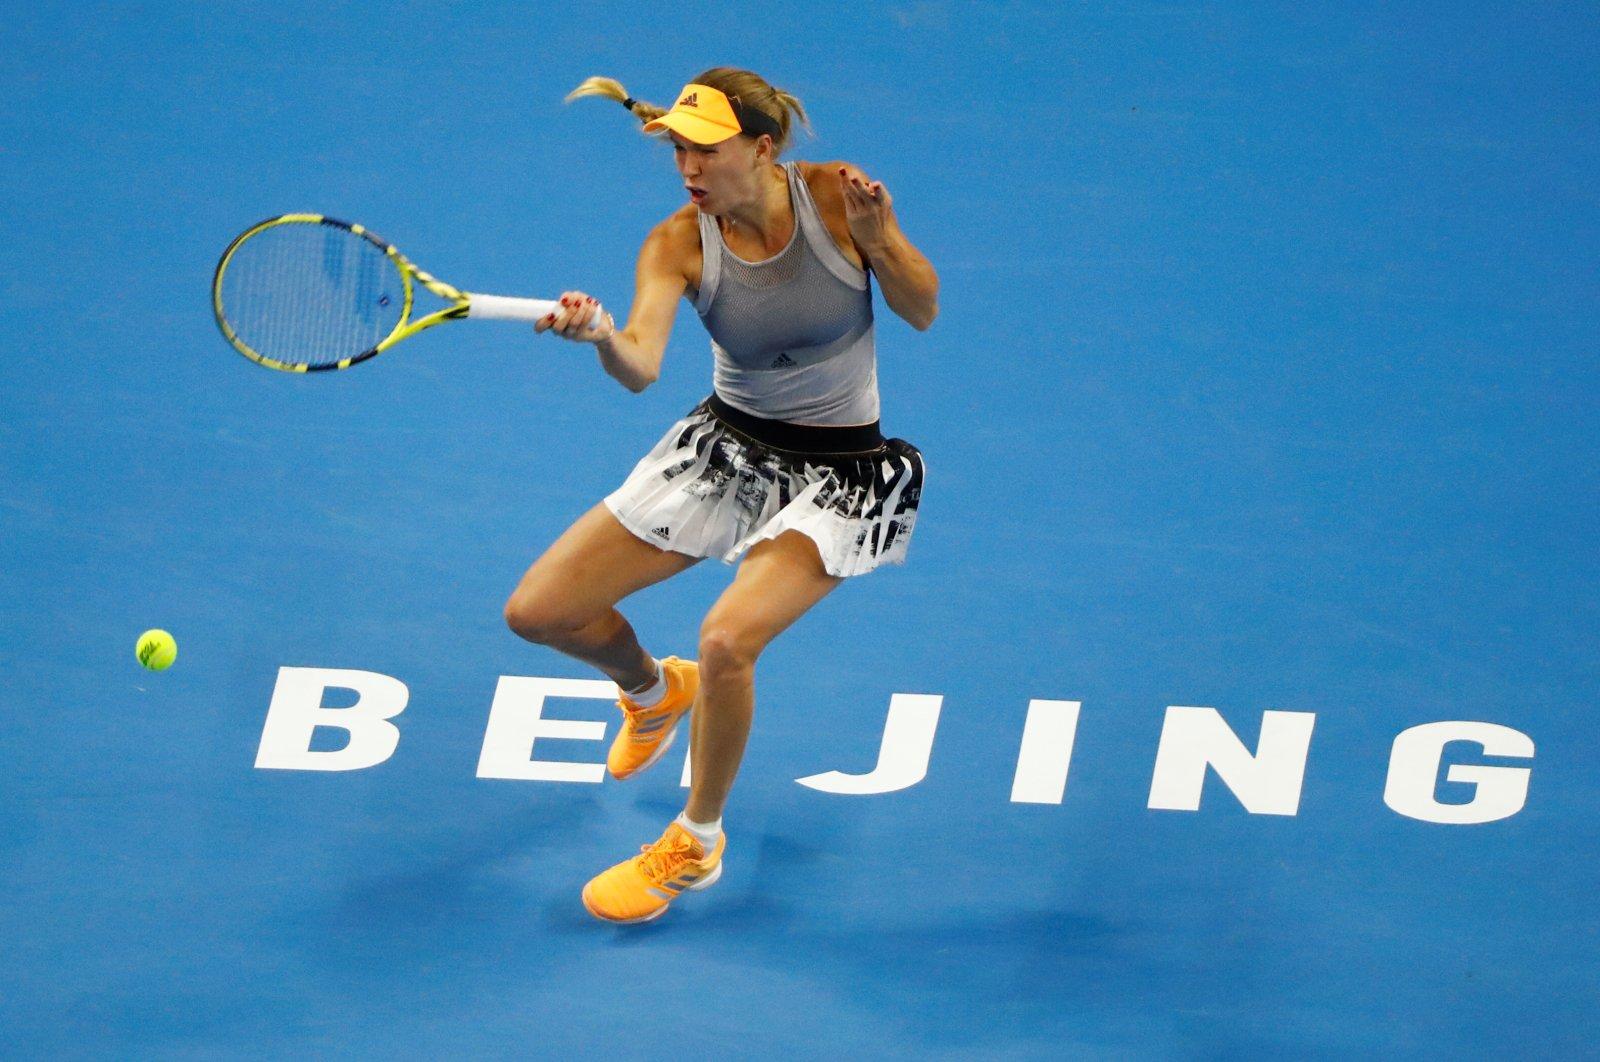 Caroline Wozniacki during China Open semifinals in Beijing, China, Oct. 5, 2019. (Reuters Photo)